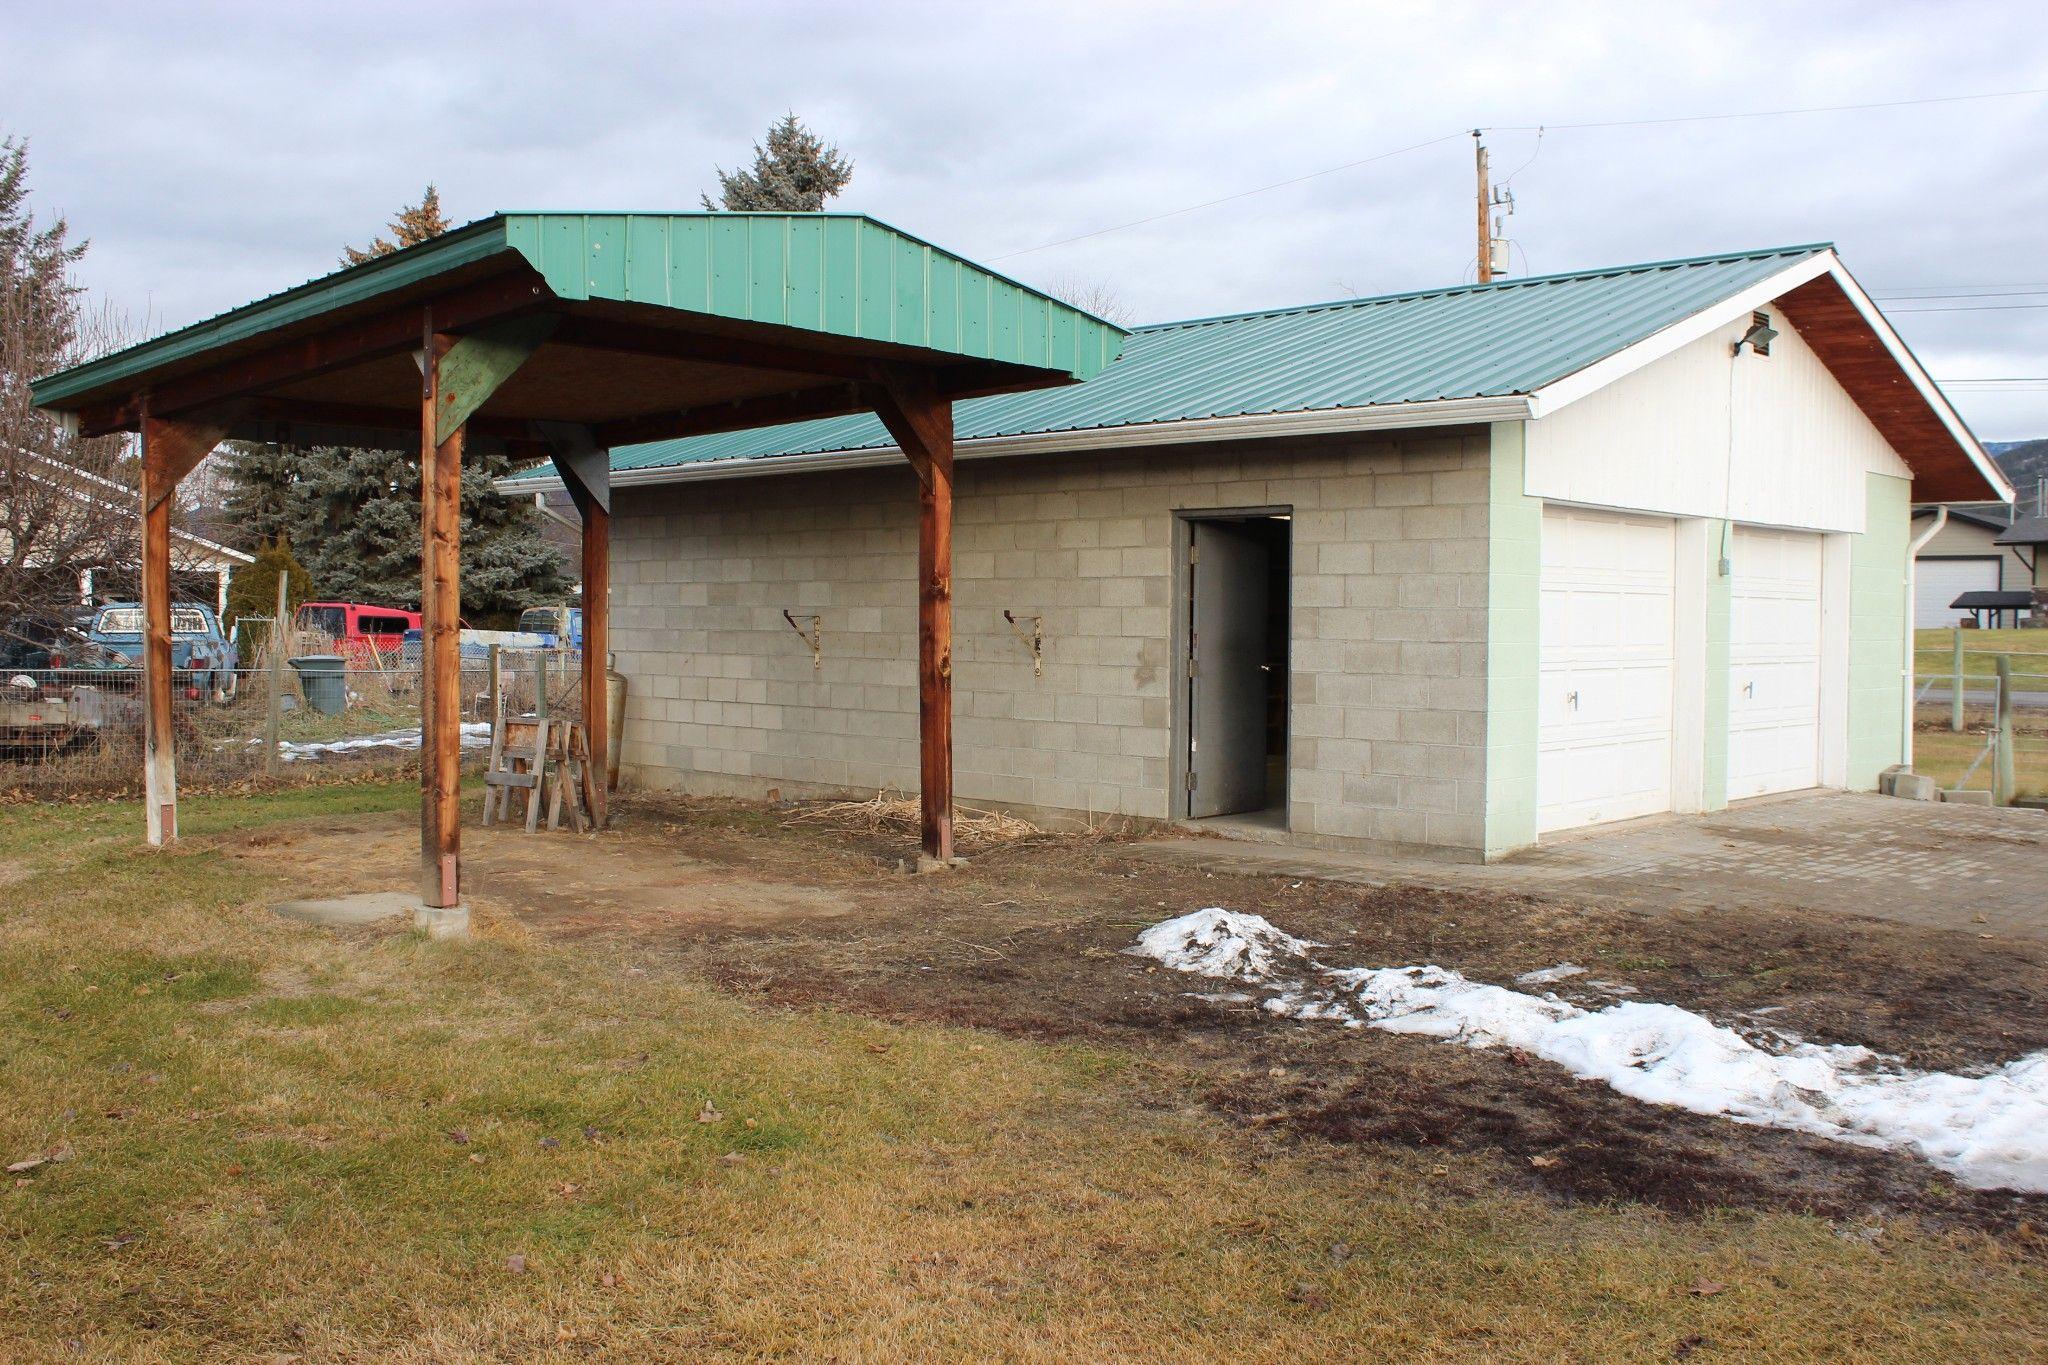 Photo 16: Photos: 6725 Heffley Road in Kamloops: Heffley House for sale : MLS®# 160007